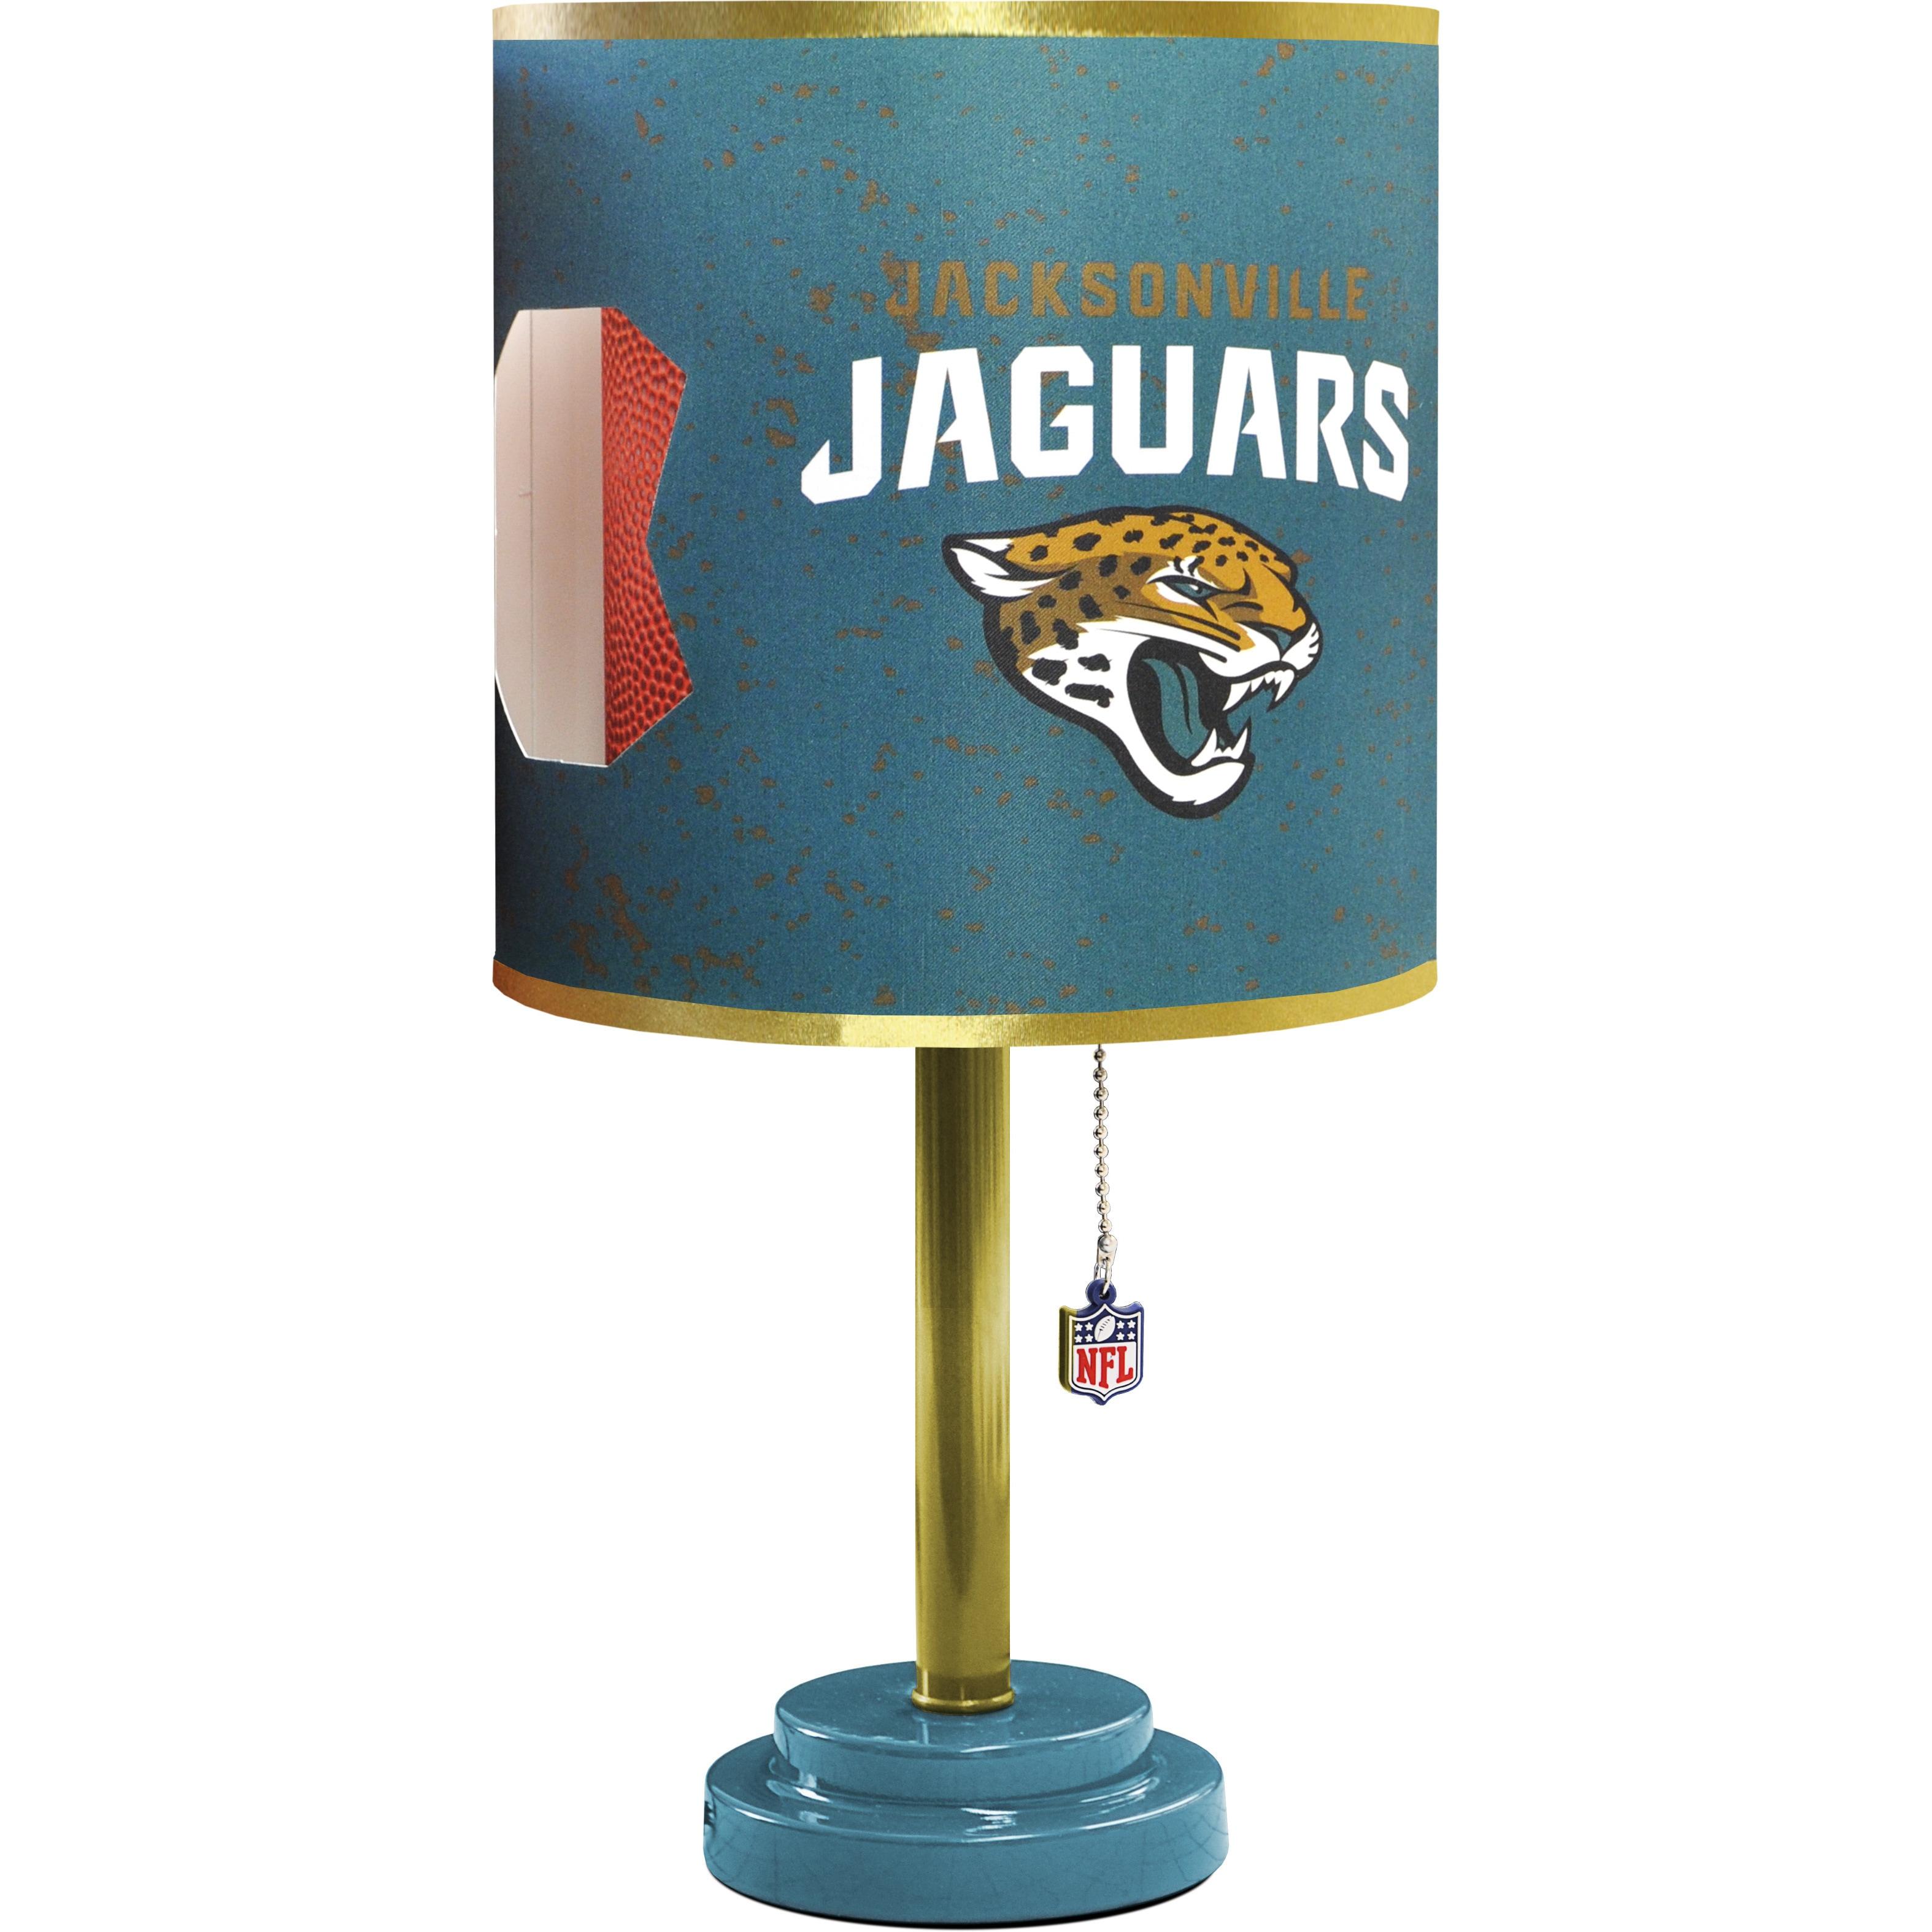 6d3b08b2 Jacksonville Jaguars Wood and Plastic Table Lamp